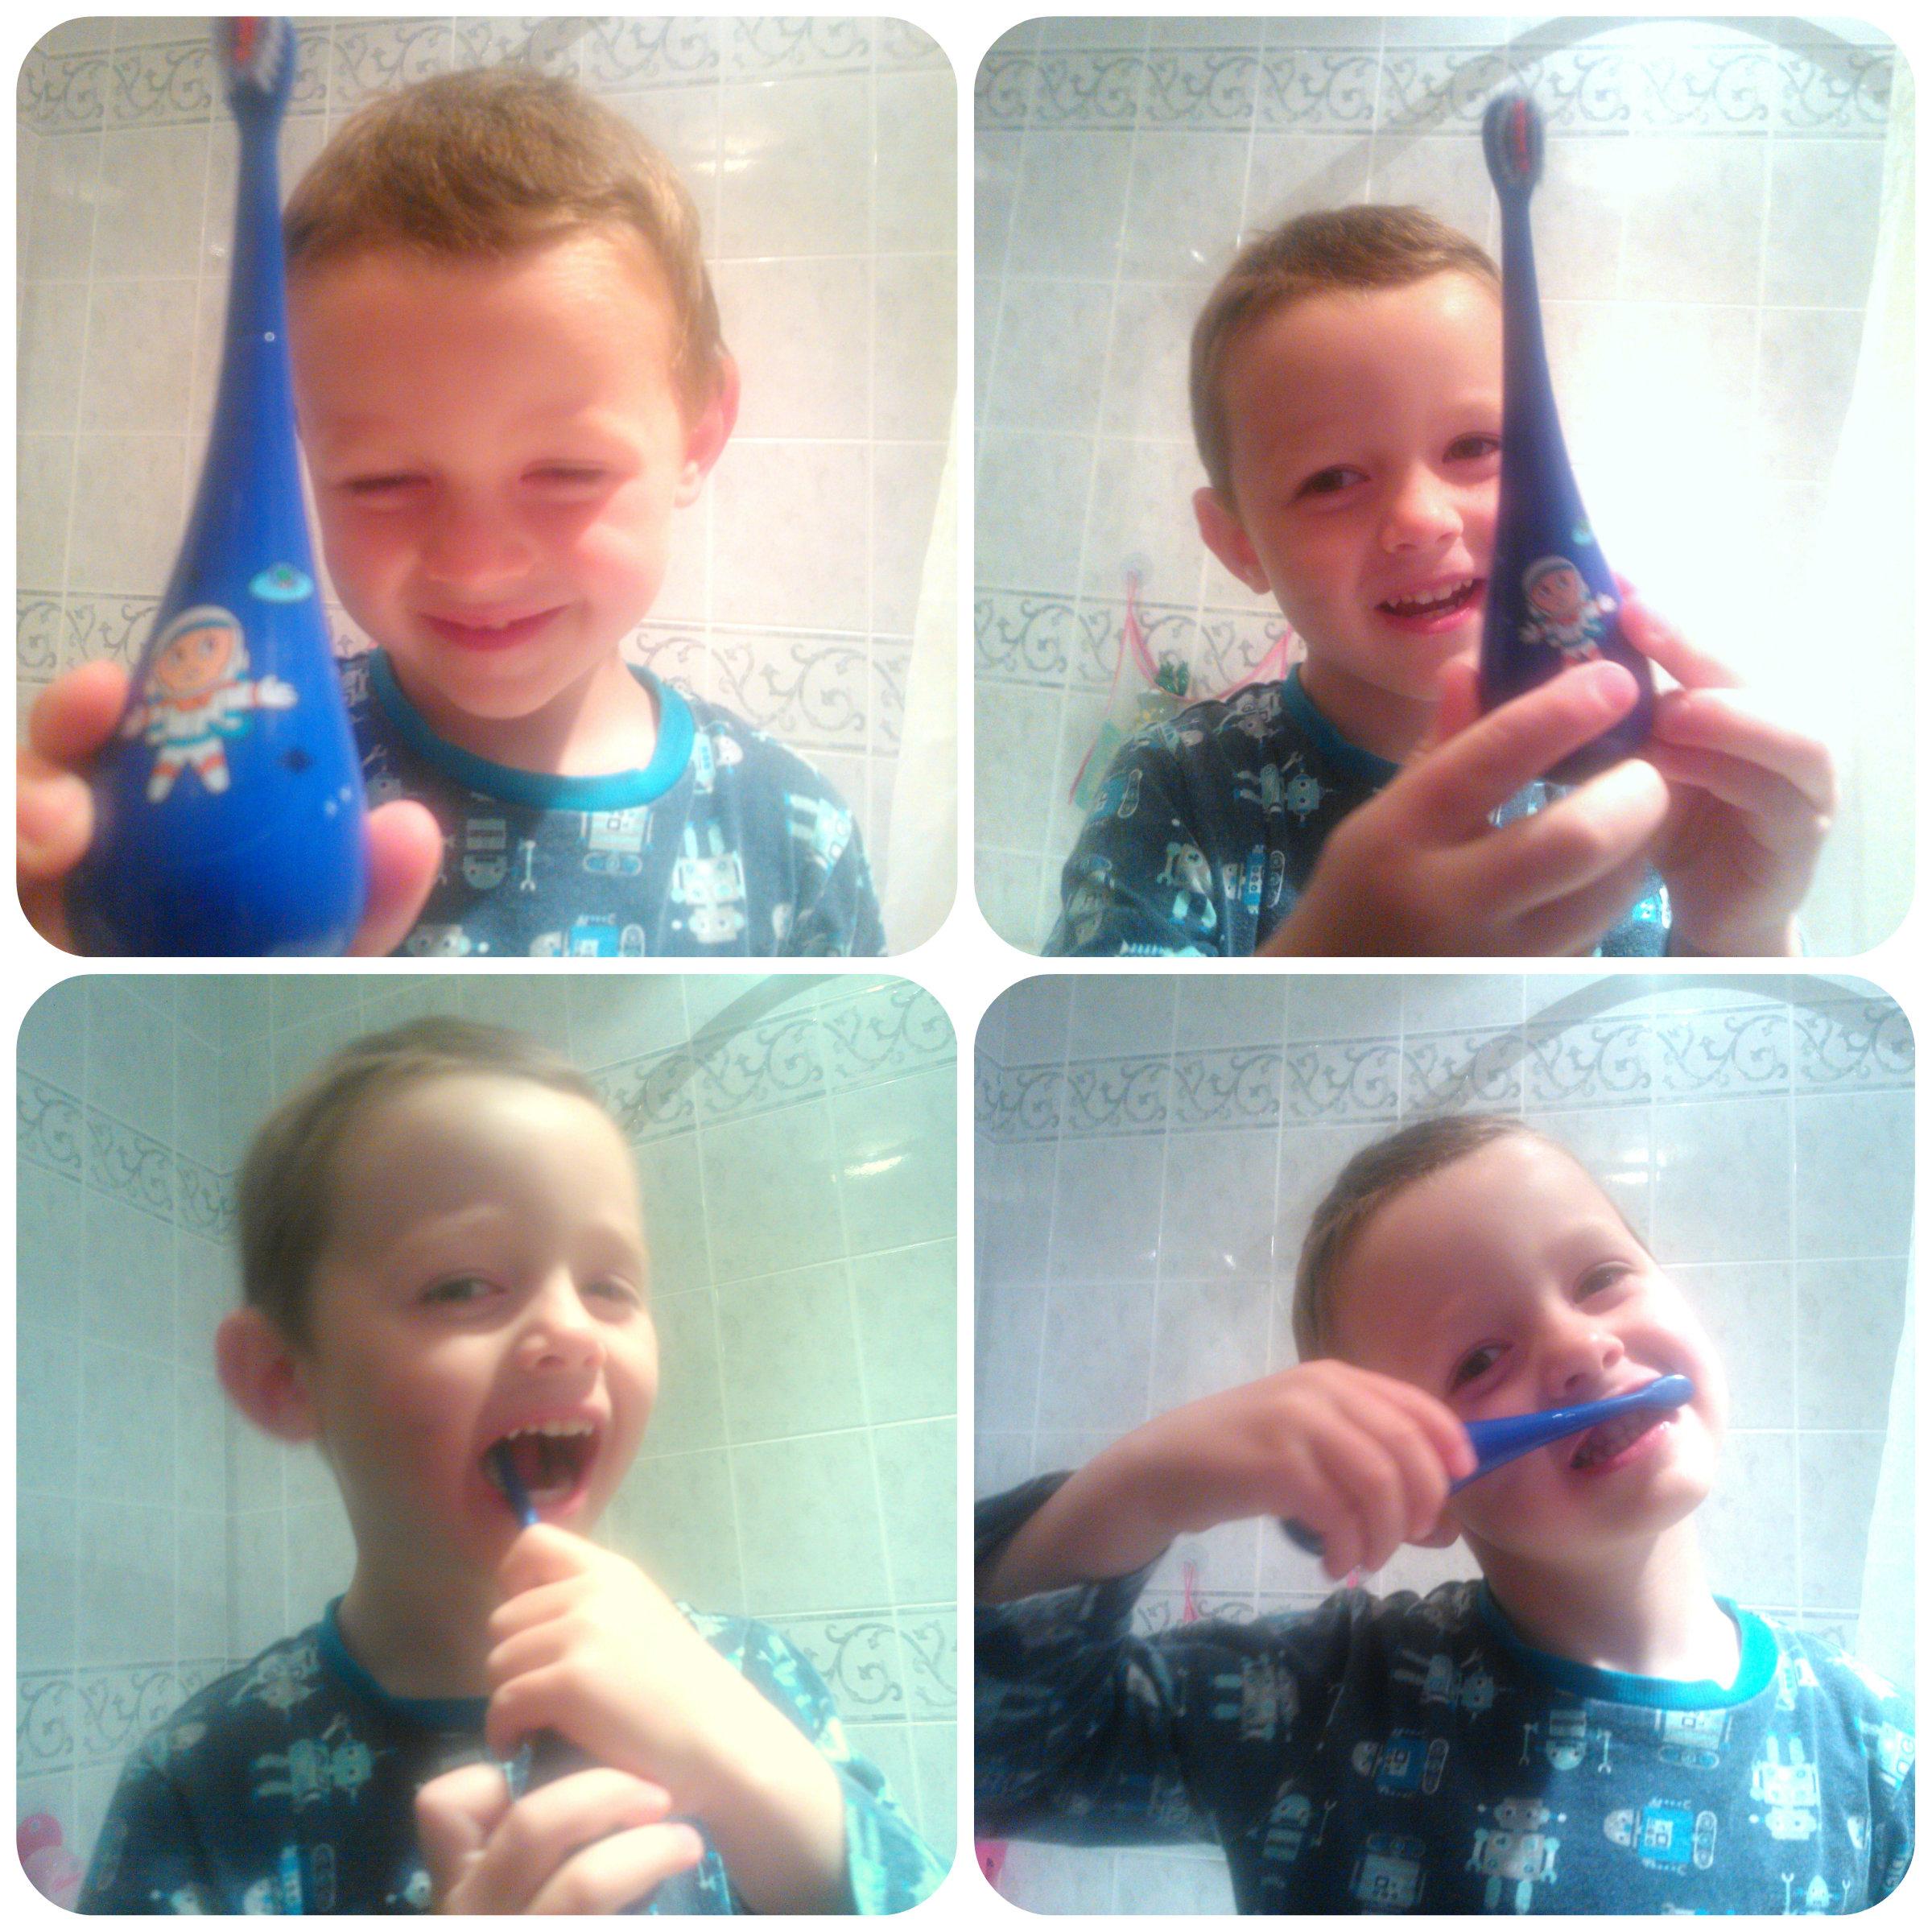 Rockabilly 3 Rockabilly Kids Toothbrush   Review